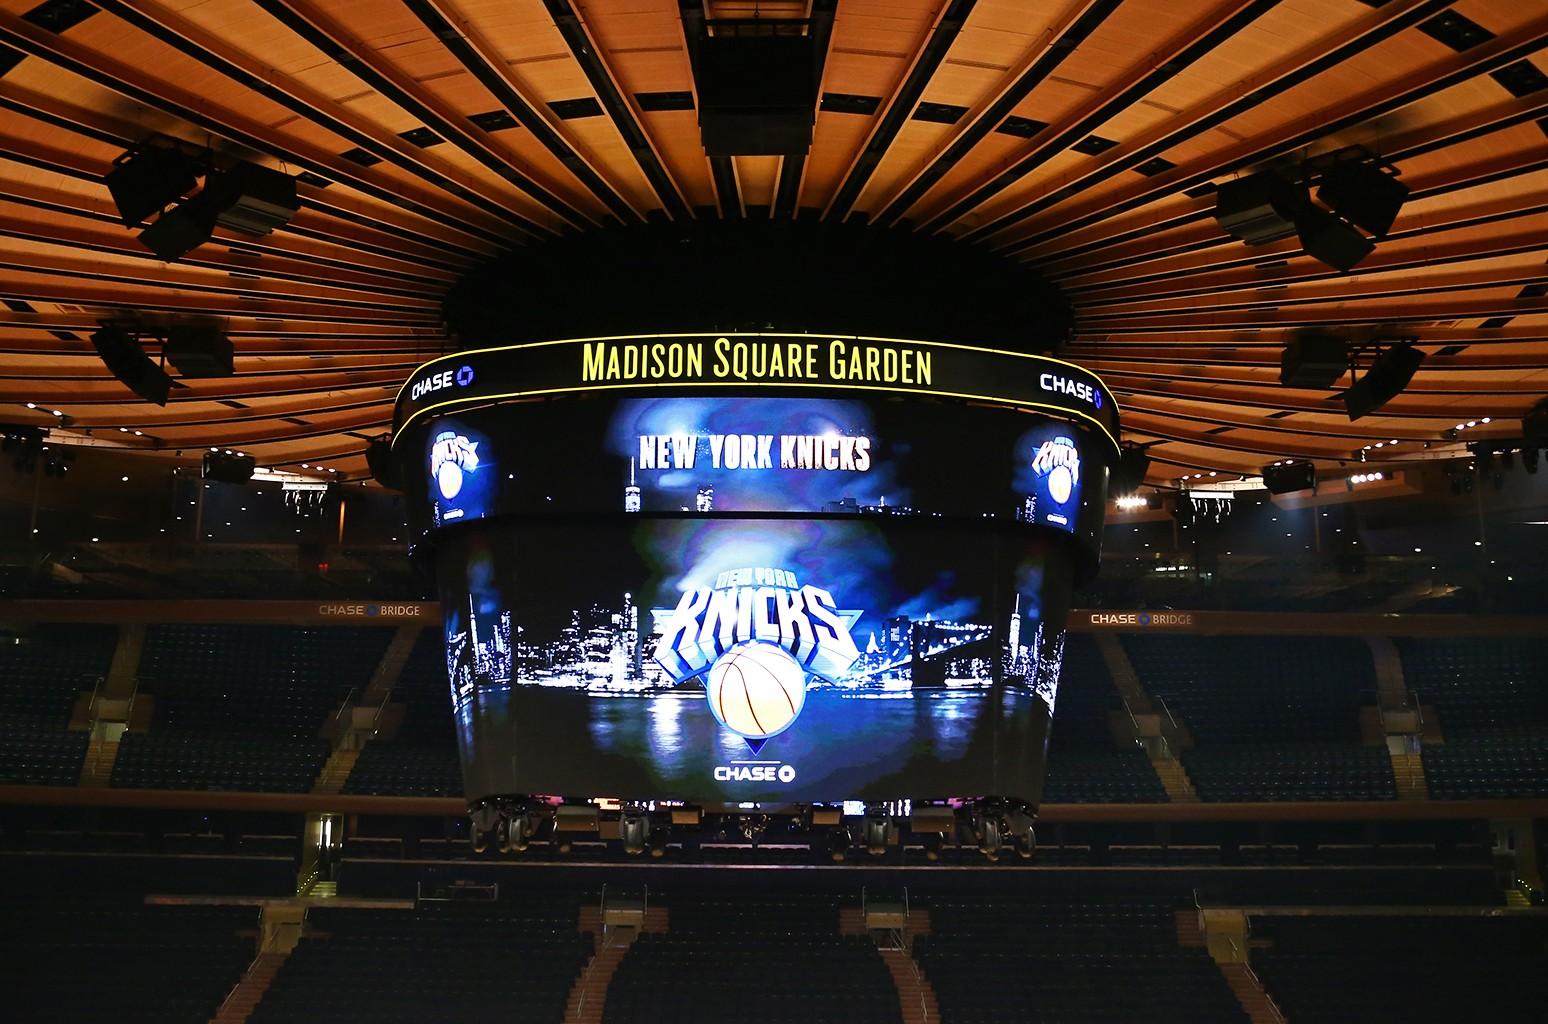 Madison Square Garden, Knicks